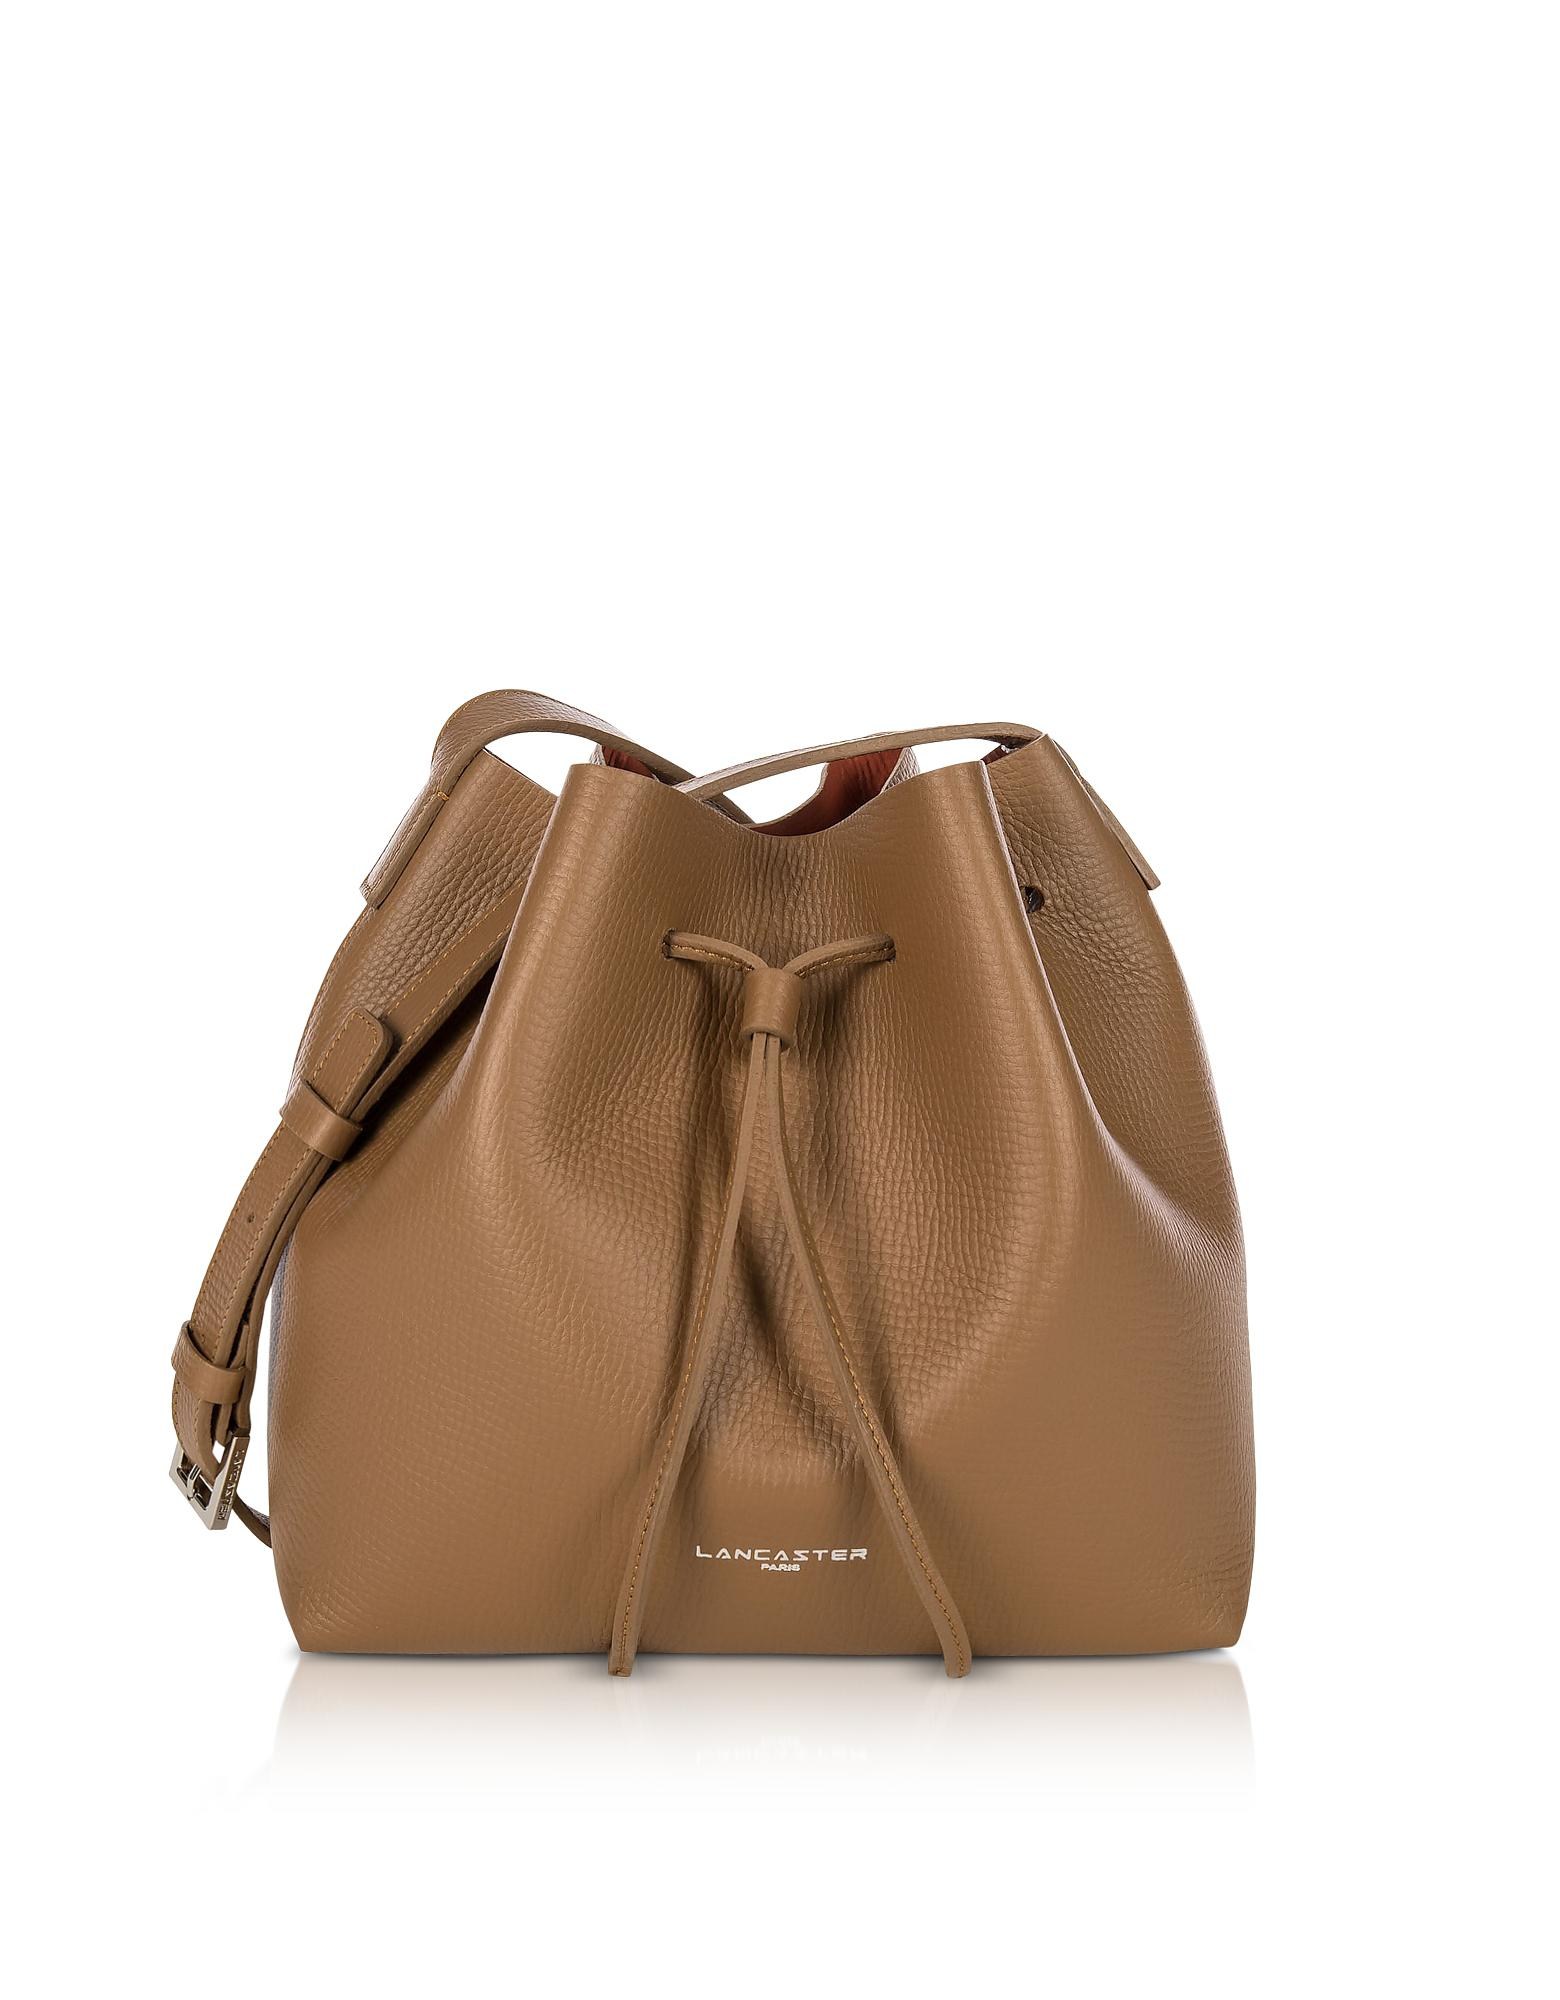 029e67df38ae Lancaster Paris. Women s Brown Pur And Element Foulonné Camel pumpkin Small  Bucket Bag